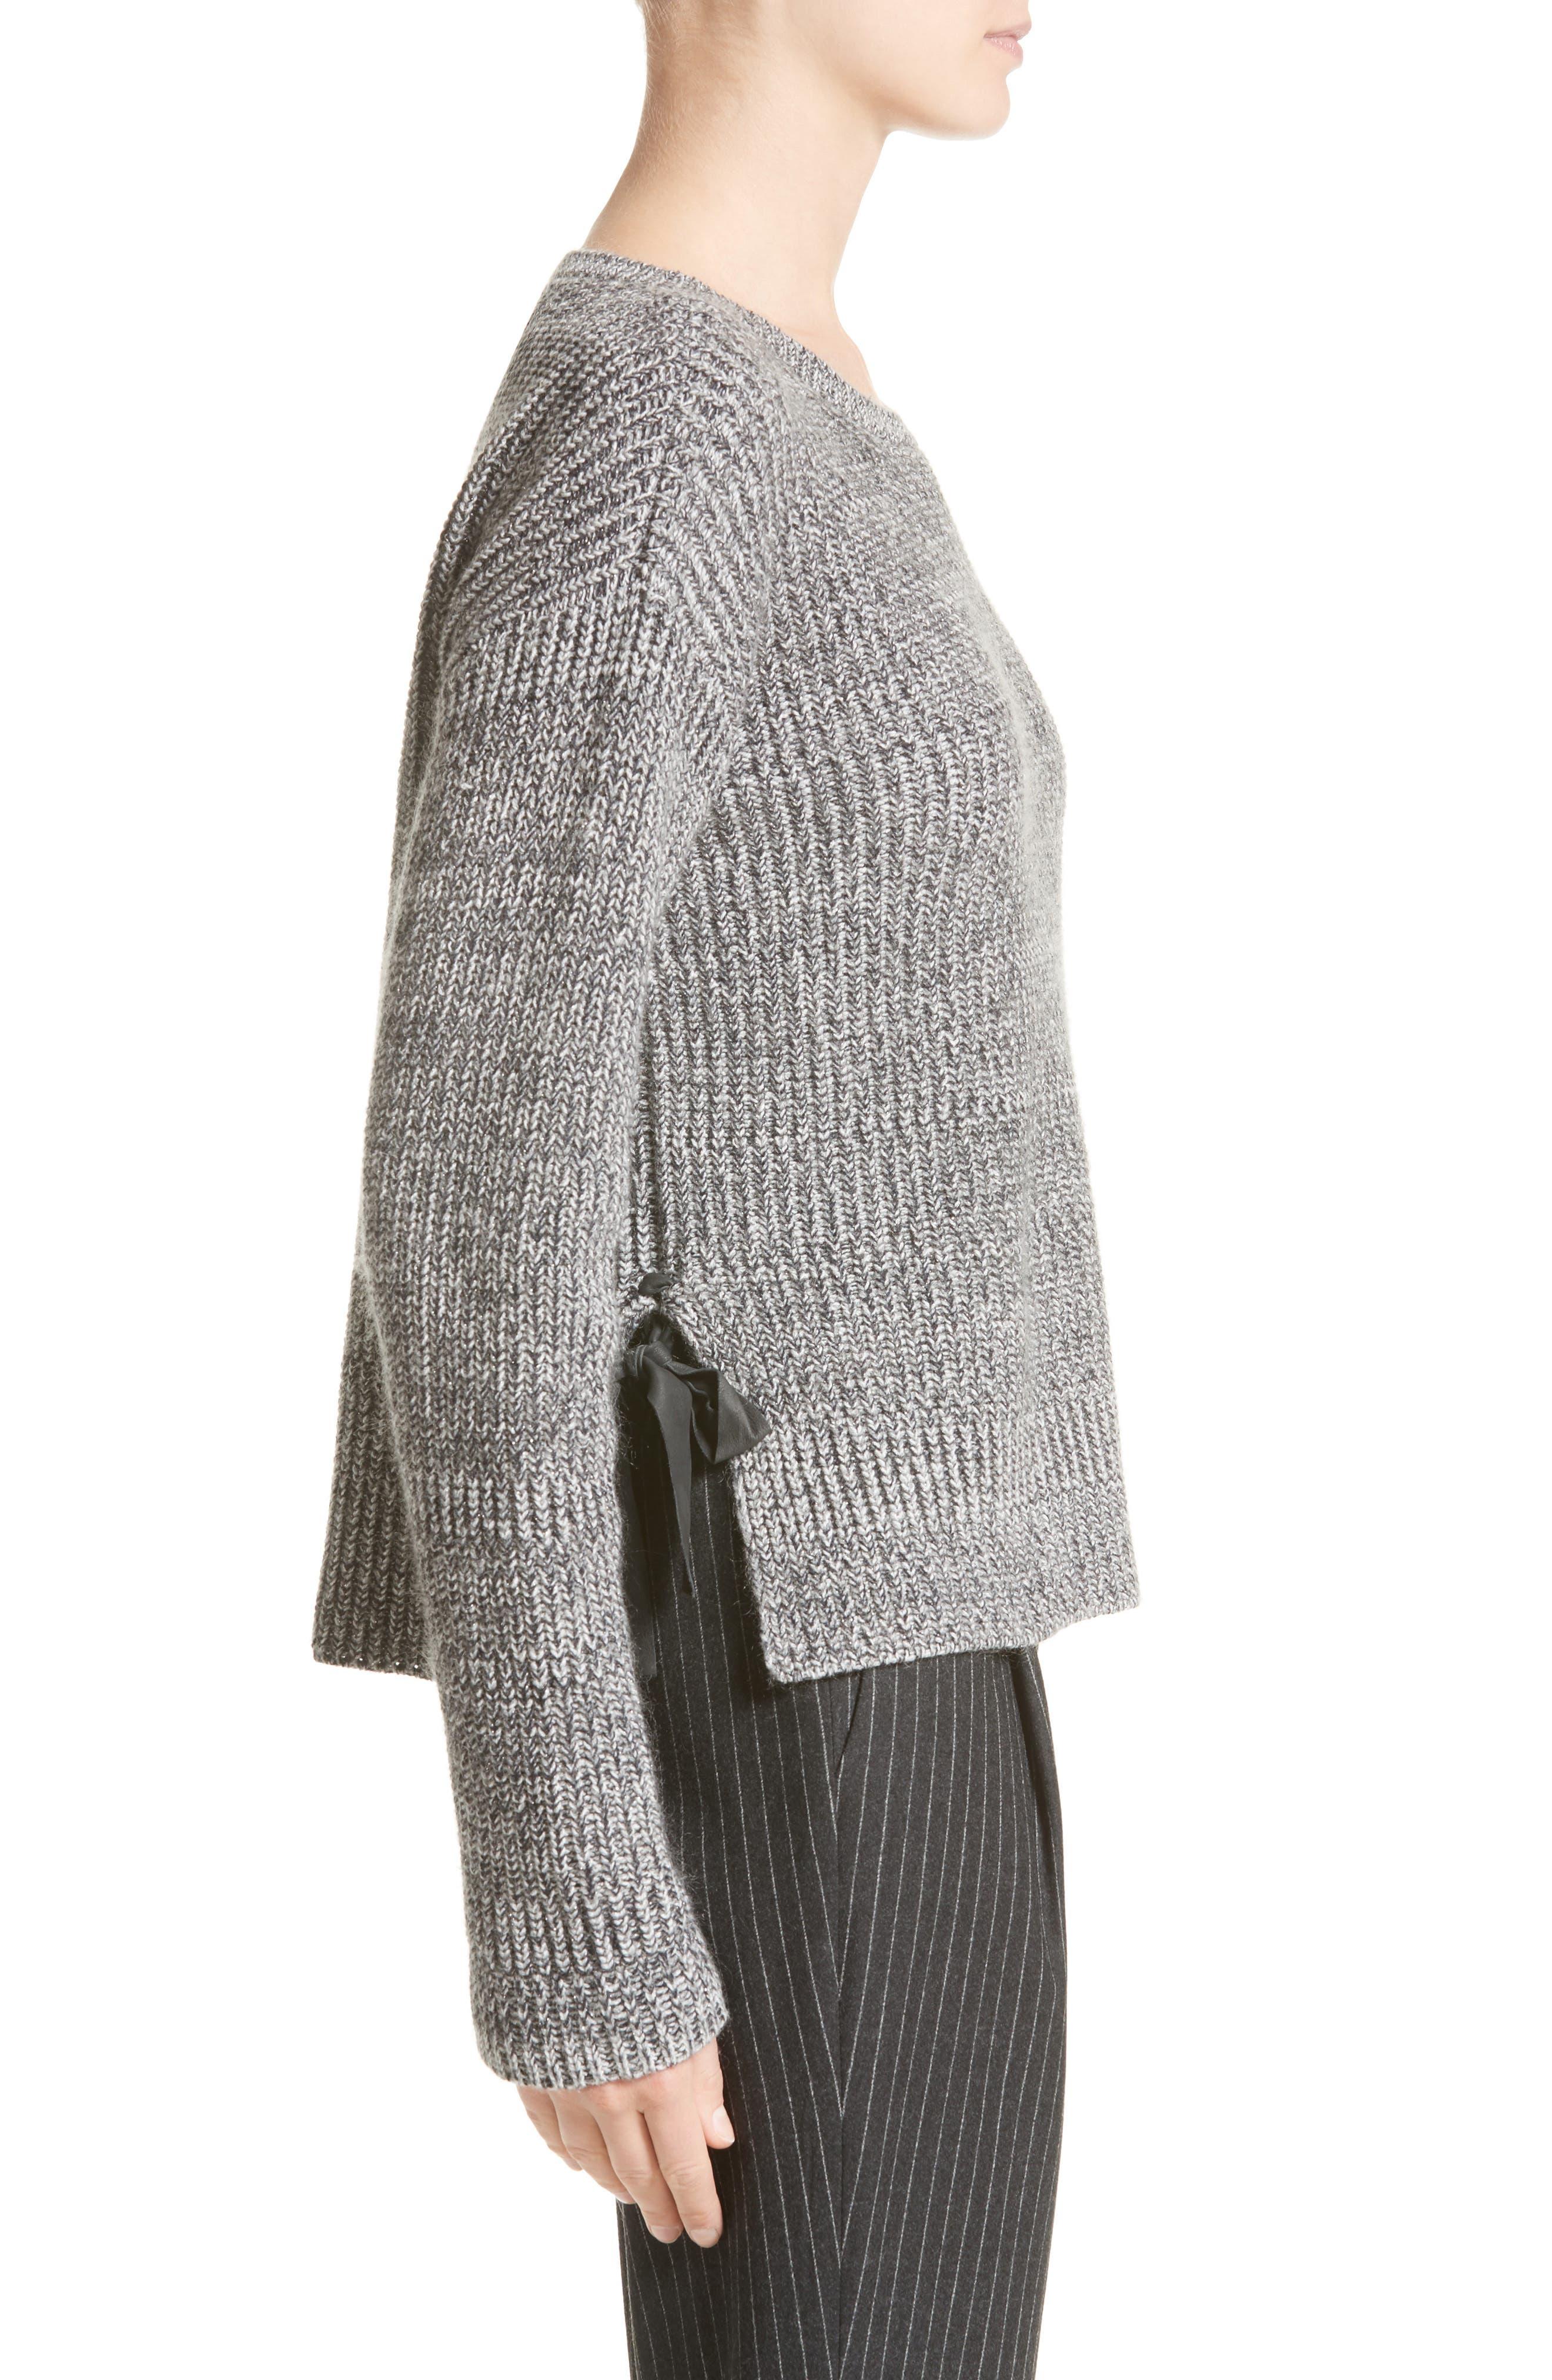 Herringbone Stitch Wool Blend Sweater,                             Alternate thumbnail 5, color,                             Grey Multi